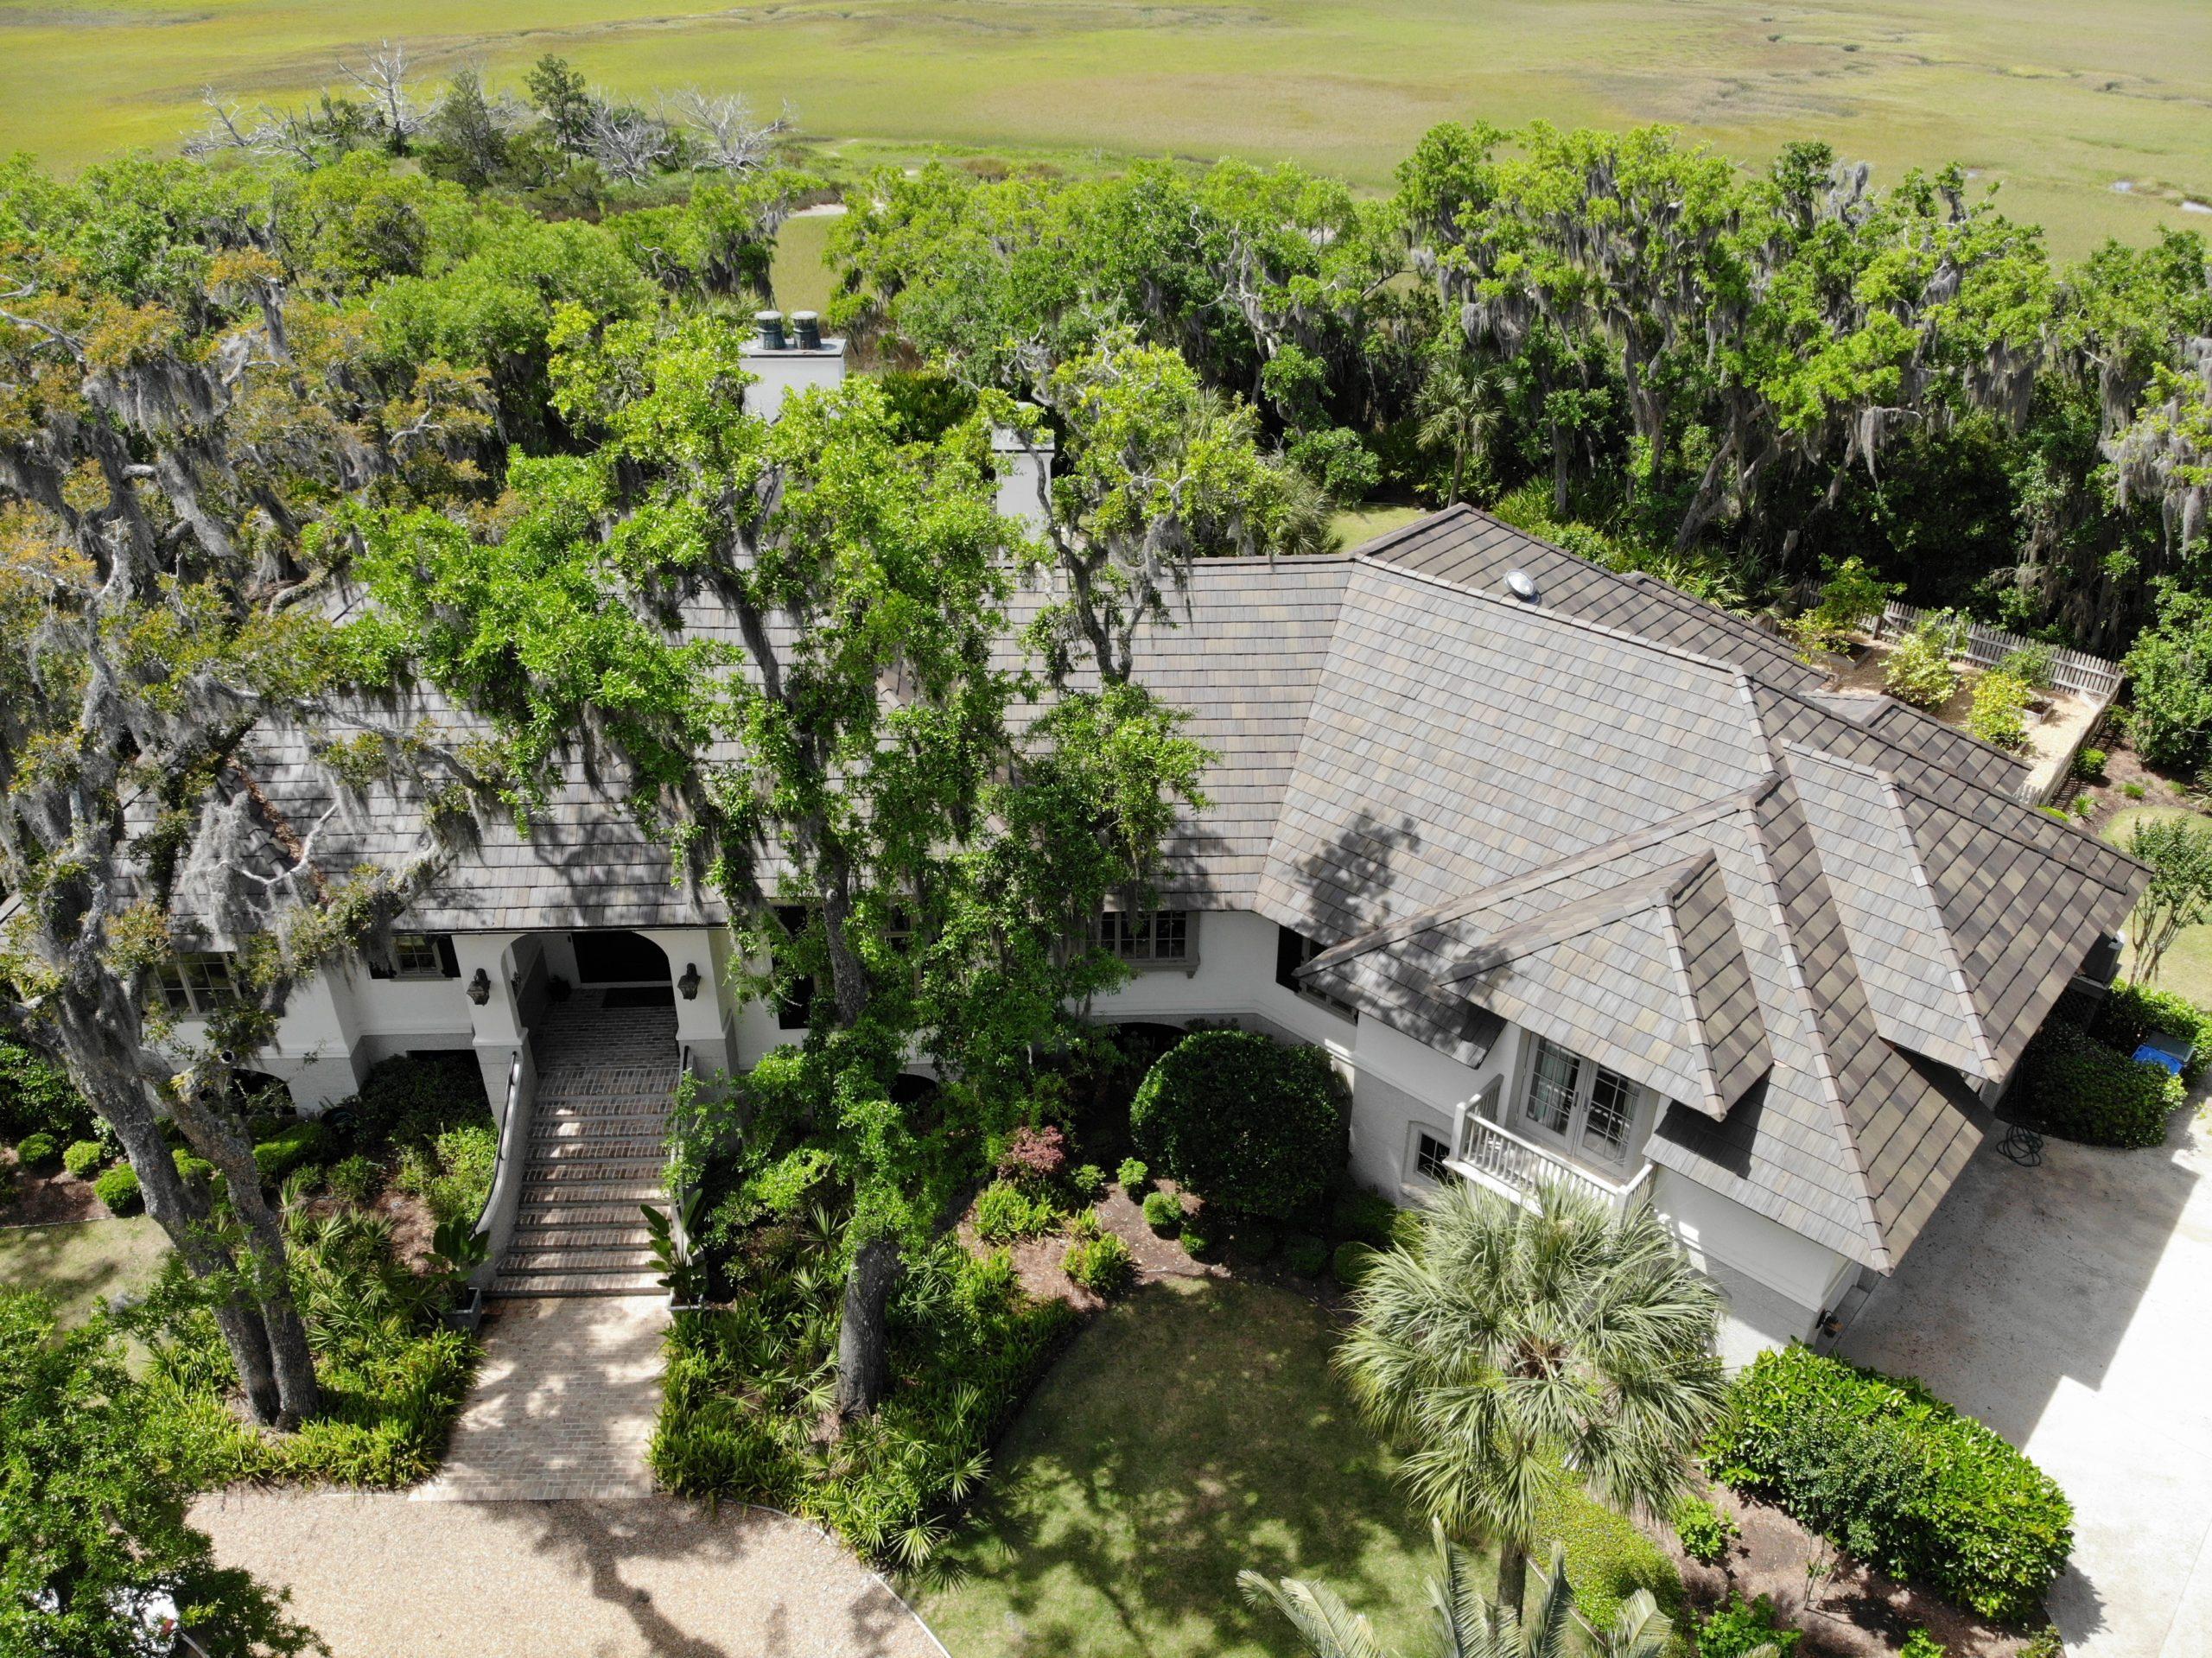 St. Simons Island Residence Ludowici Roof Tile